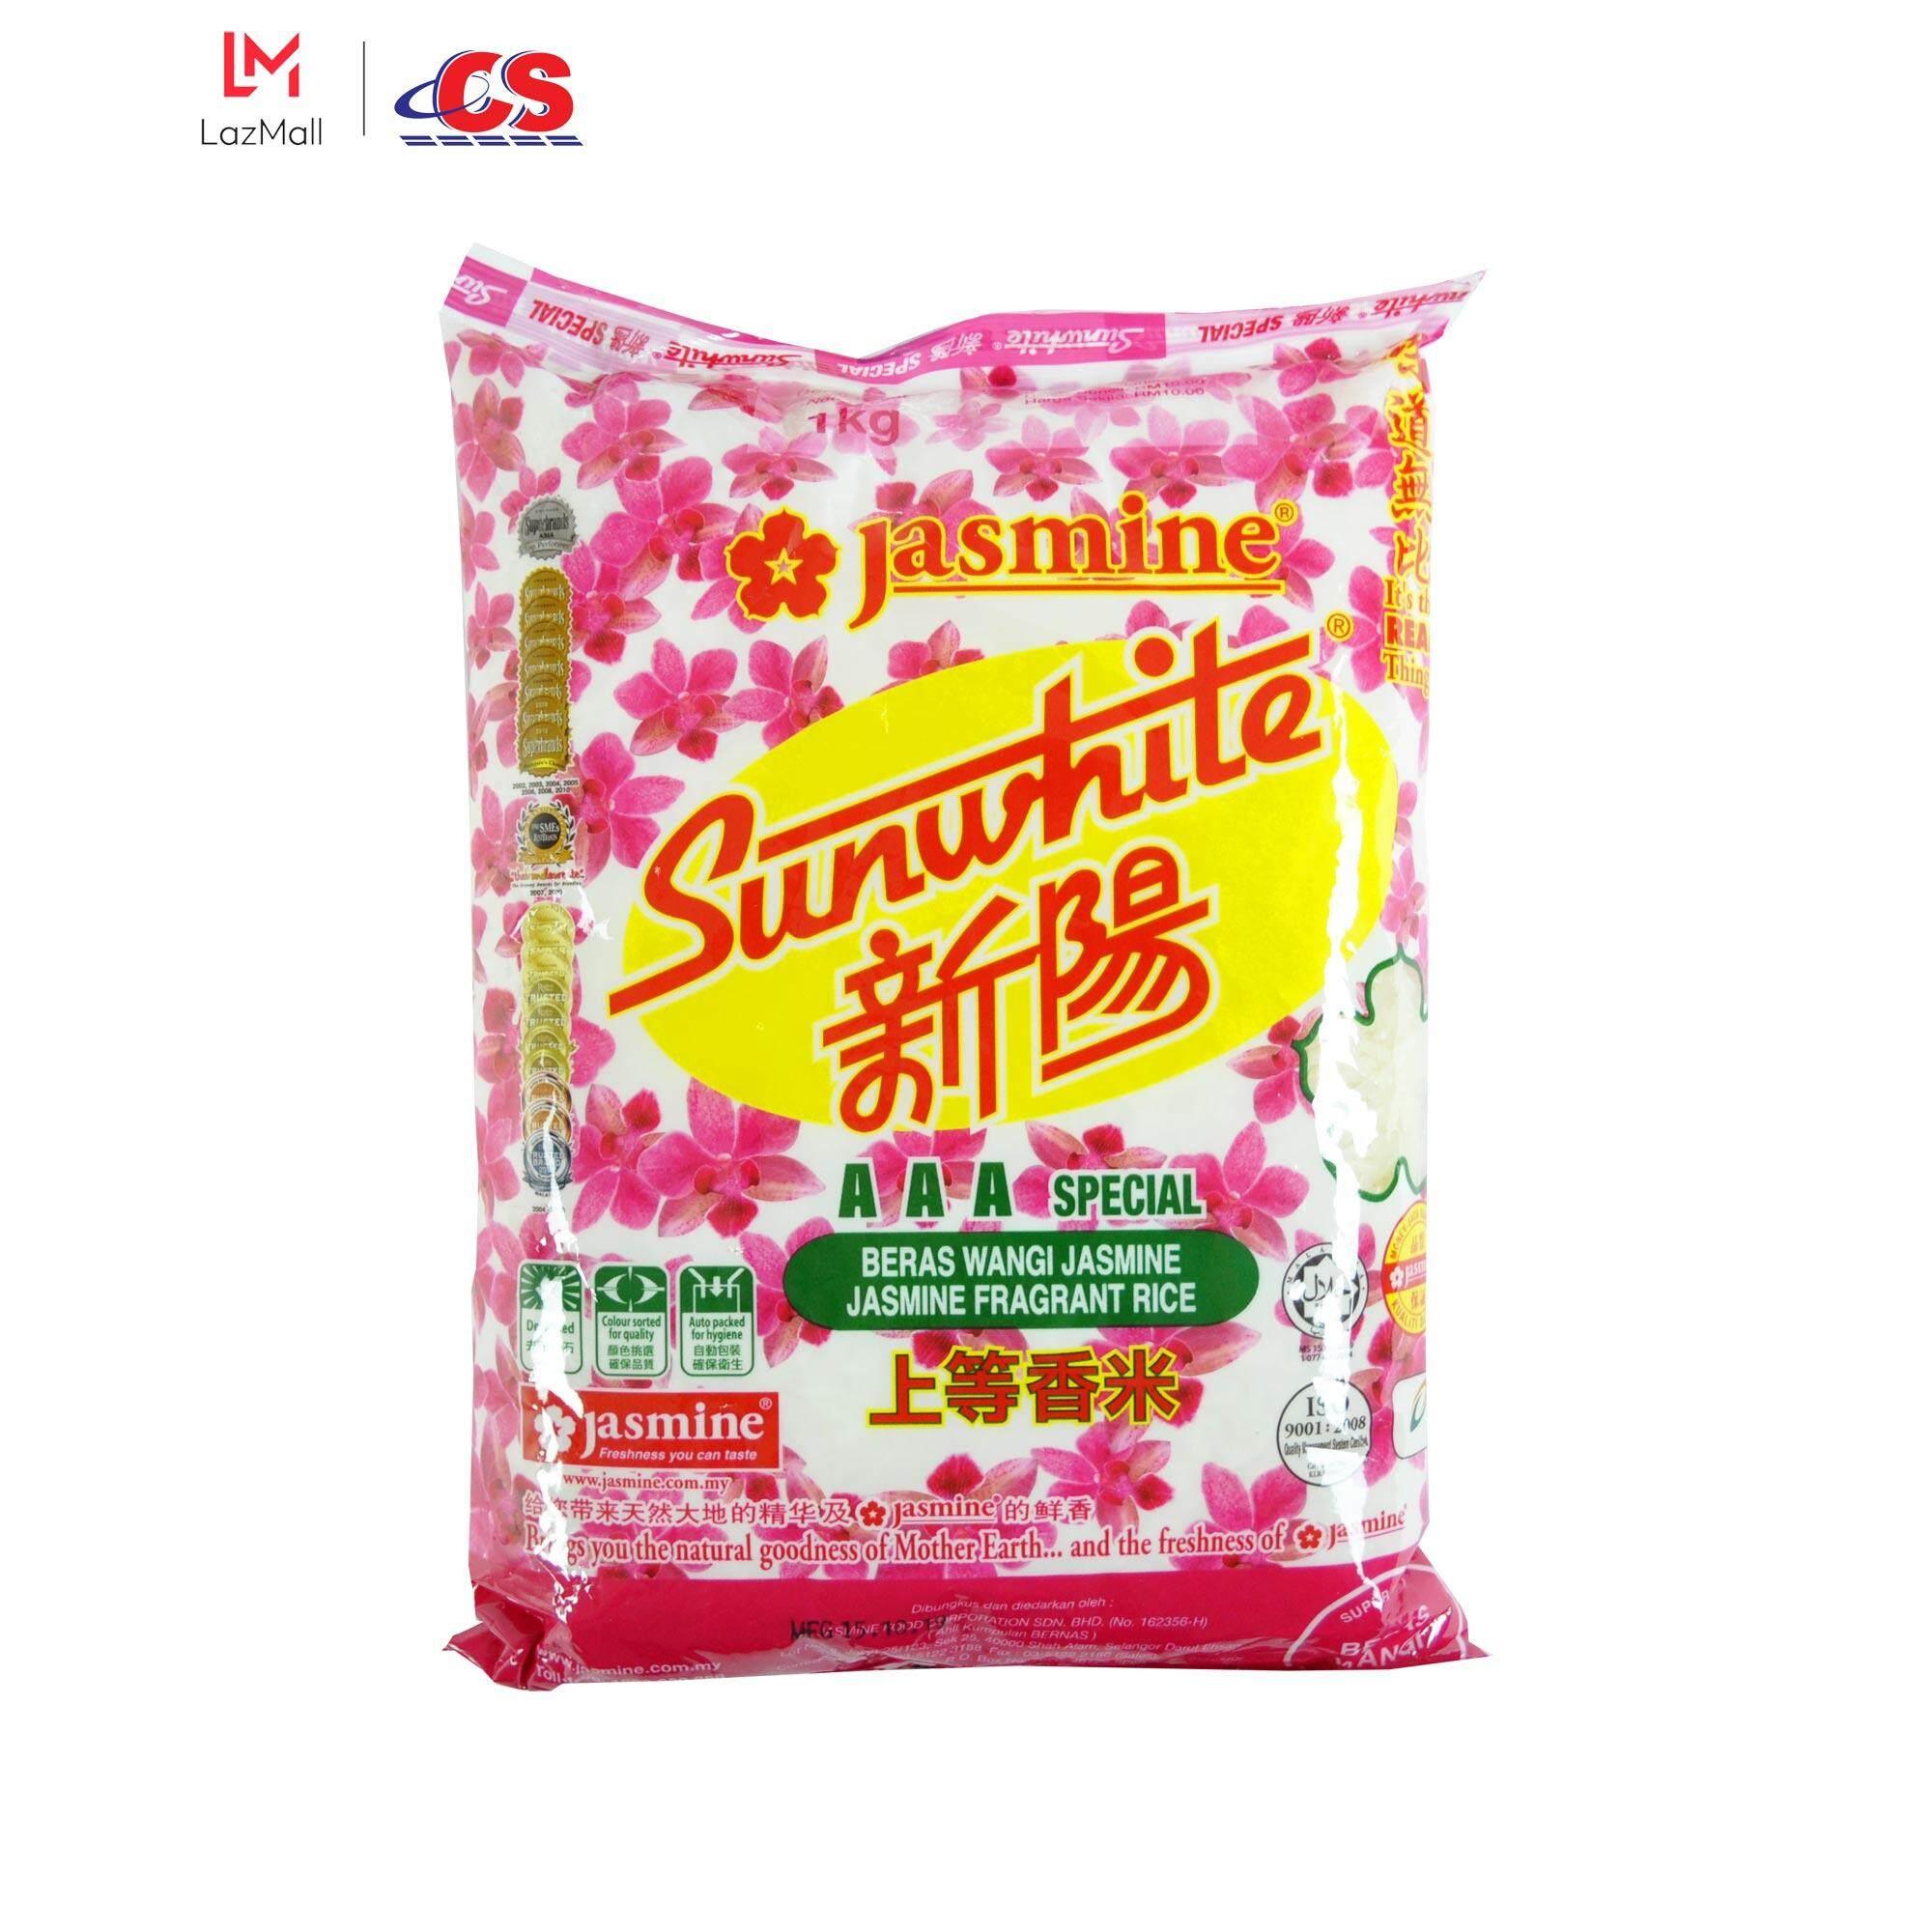 JASMINE Sunwhite Fragnance Rice 1kg